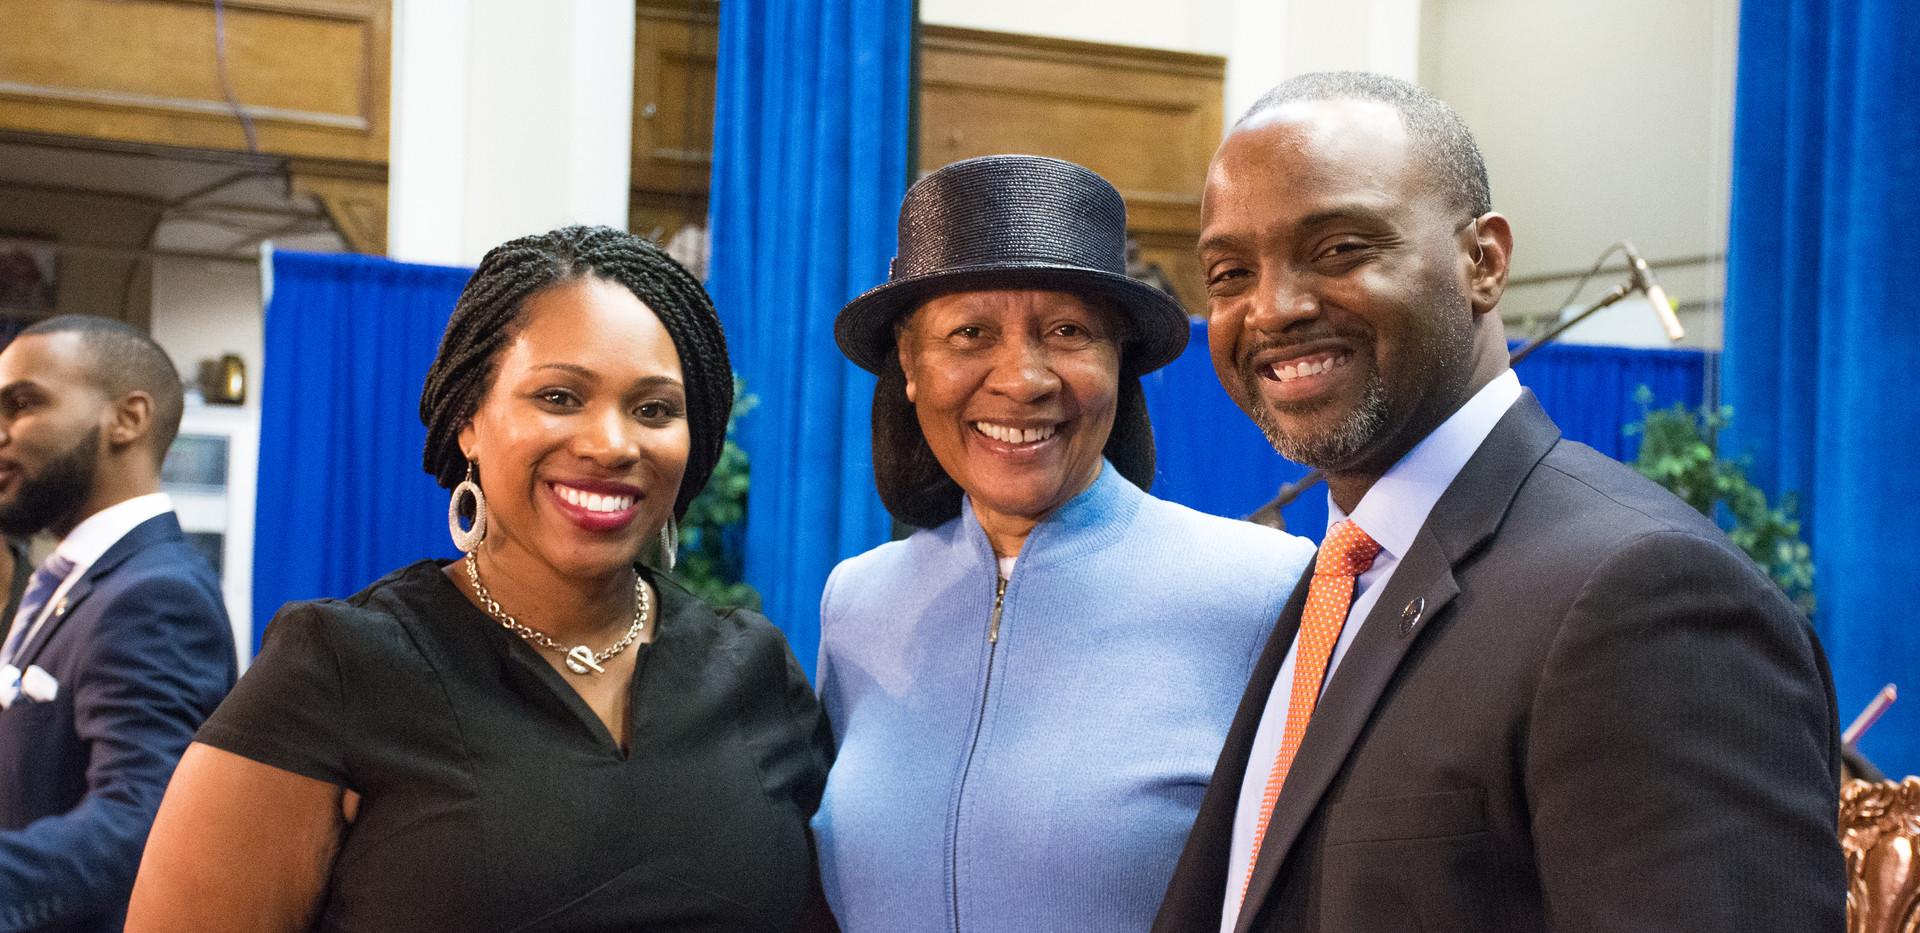 Dr. Fry Brown, Dr. Haysbert, Dr. Sabin D